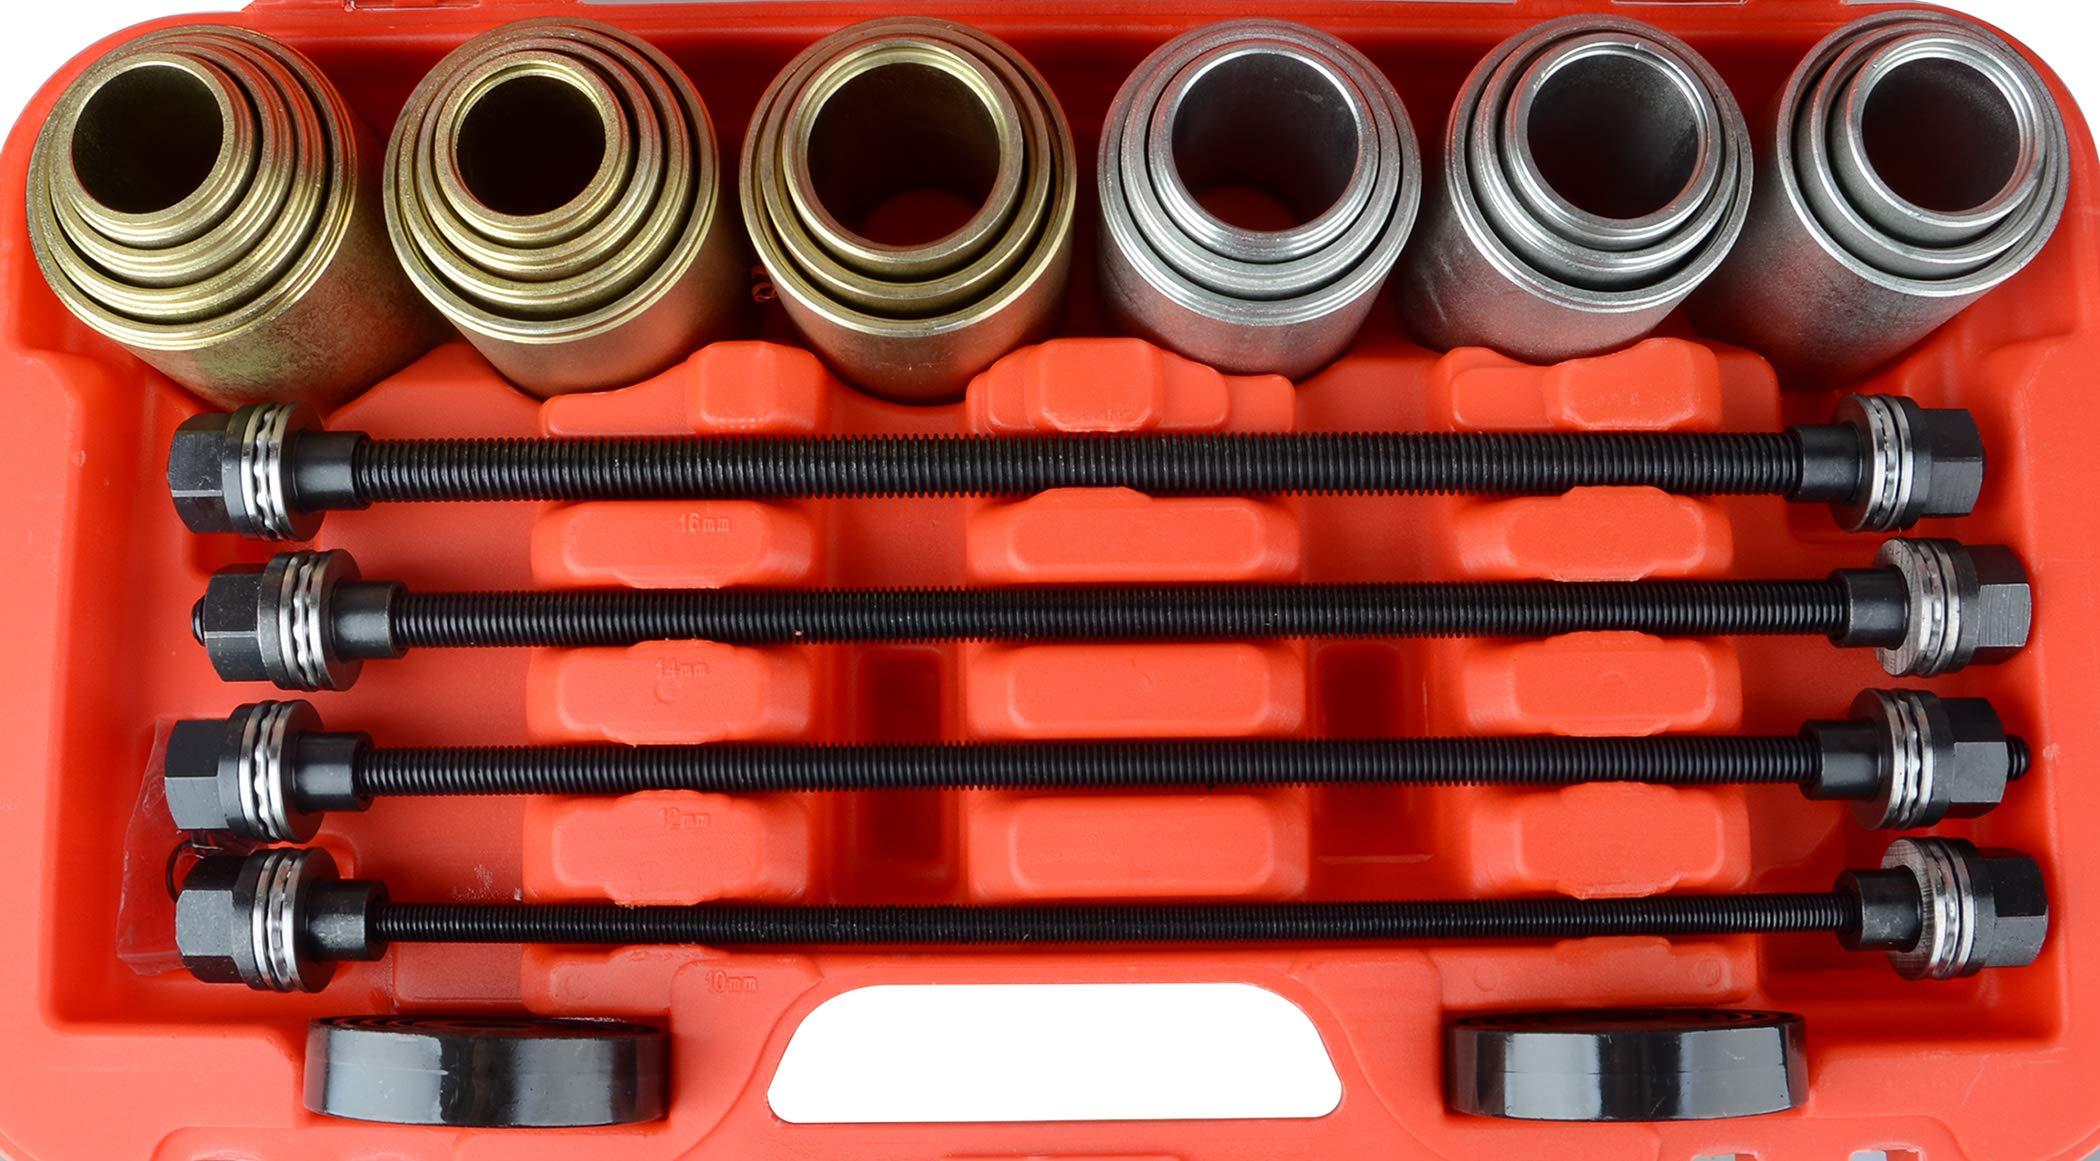 DA YUAN Universal Press and Pull Sleeve Remove Install Bushes Bearings Garage Tool Kit by DA YUAN (Image #2)